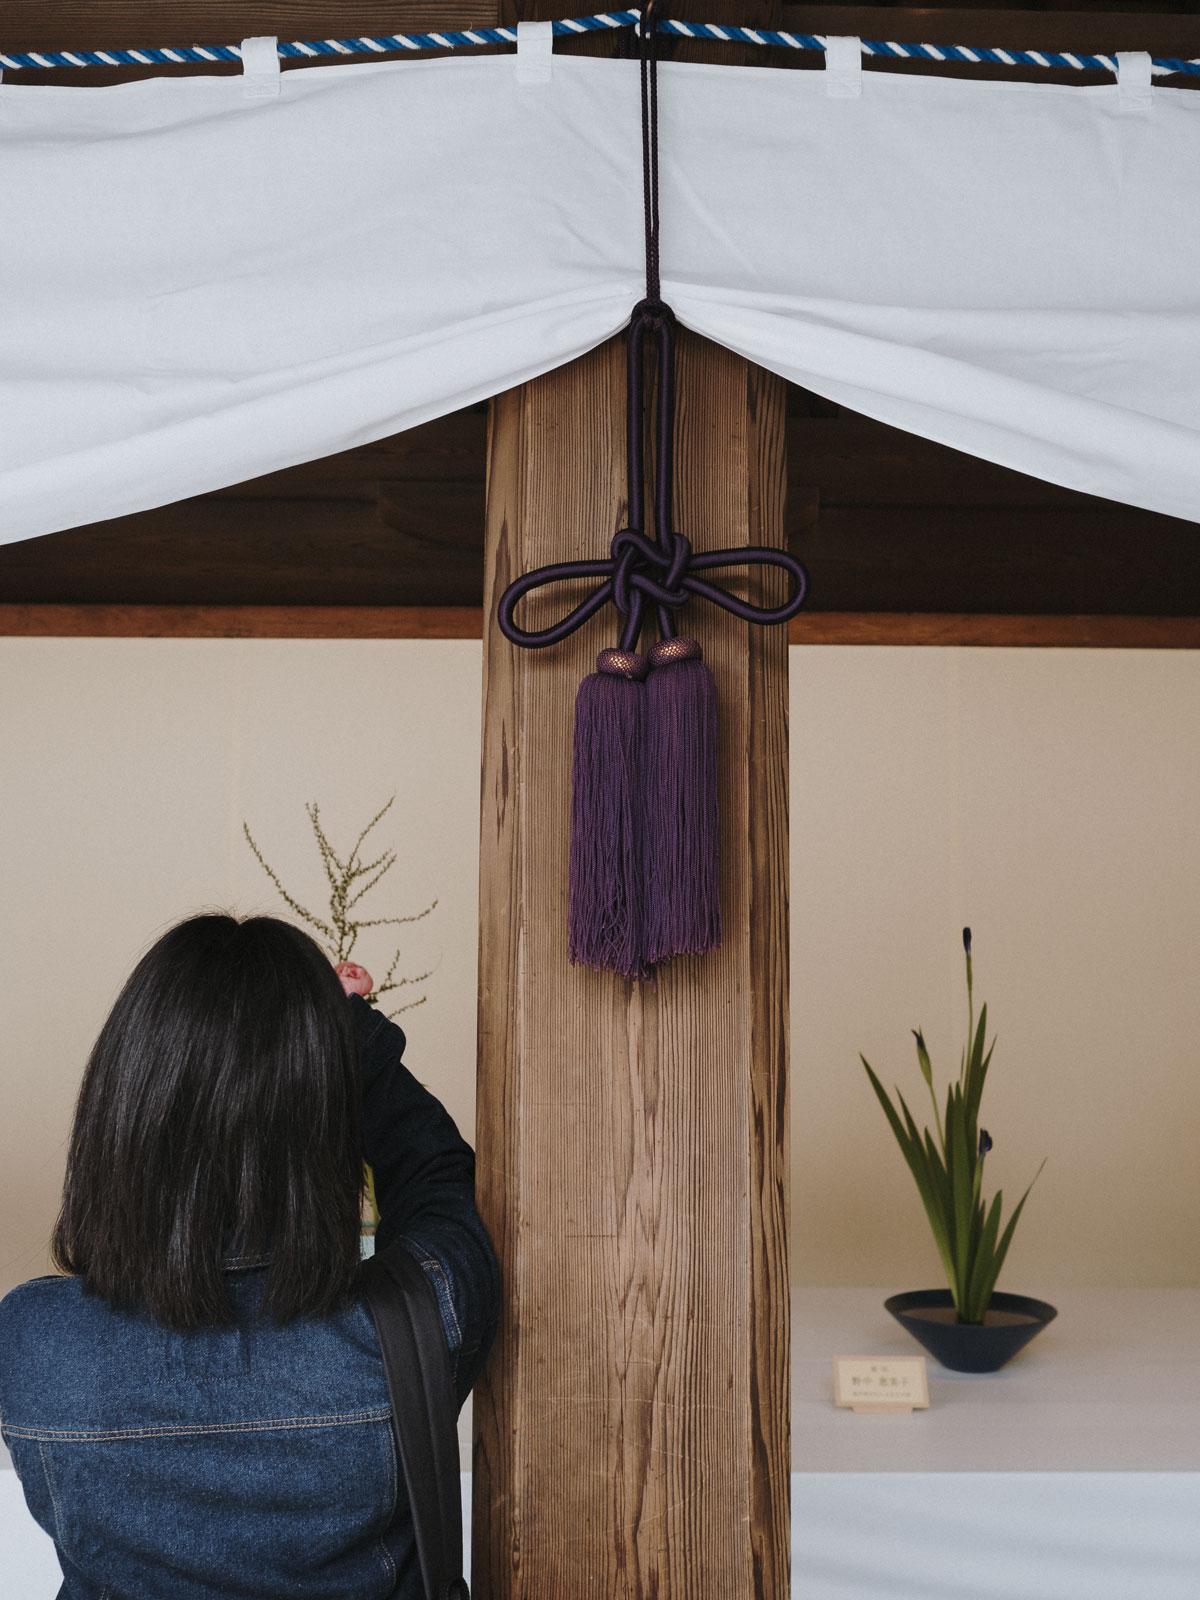 charlie-may-kuro-tokyo-japan-meiji-shrine-temple-24